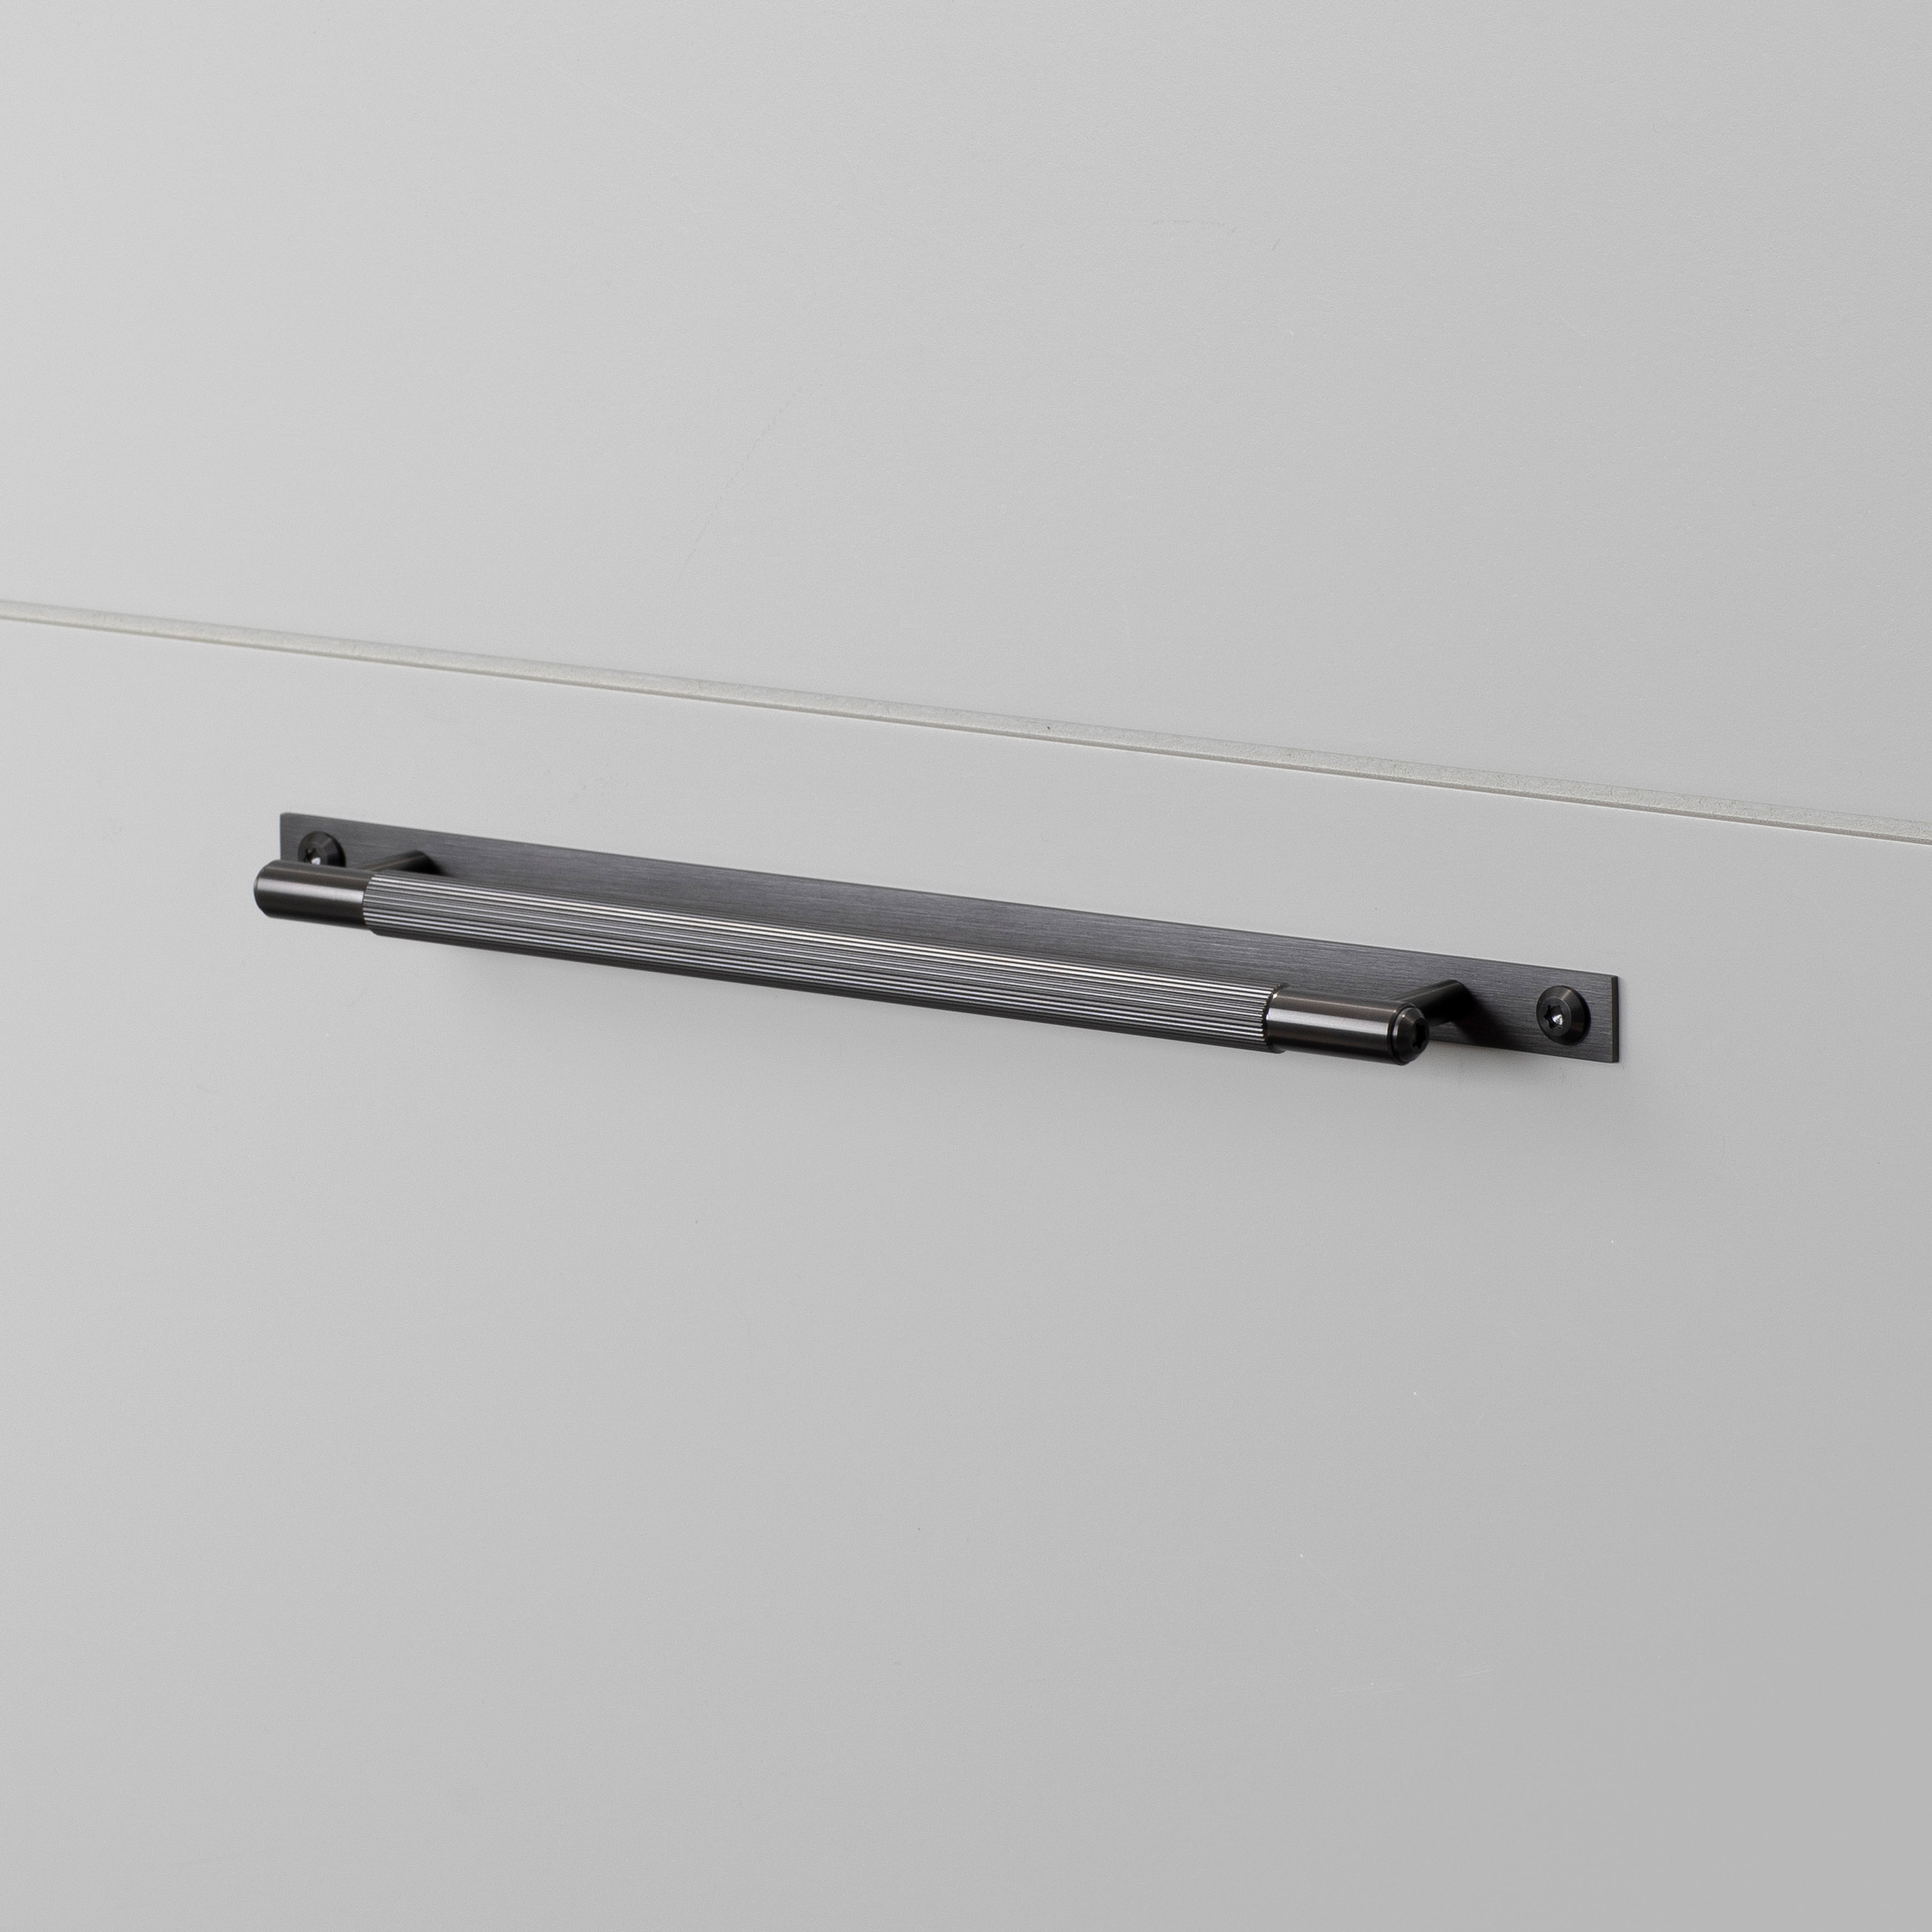 PULL BAR / PLATE / LINEAR / GUN METAL